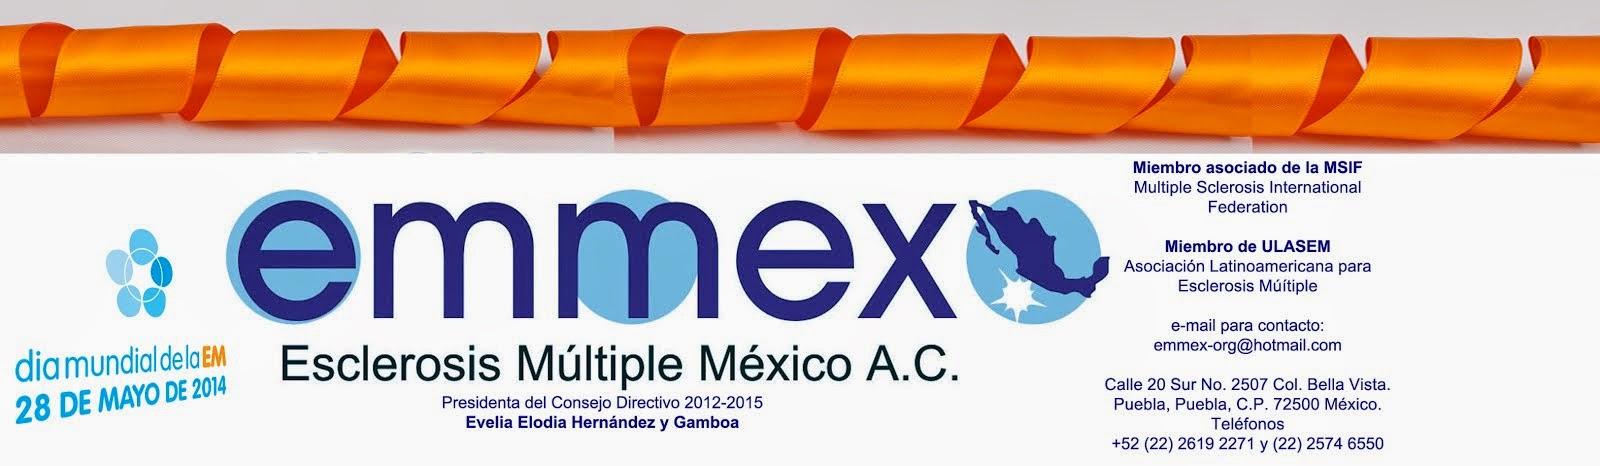 Esclerosis Múltiple México A.C.